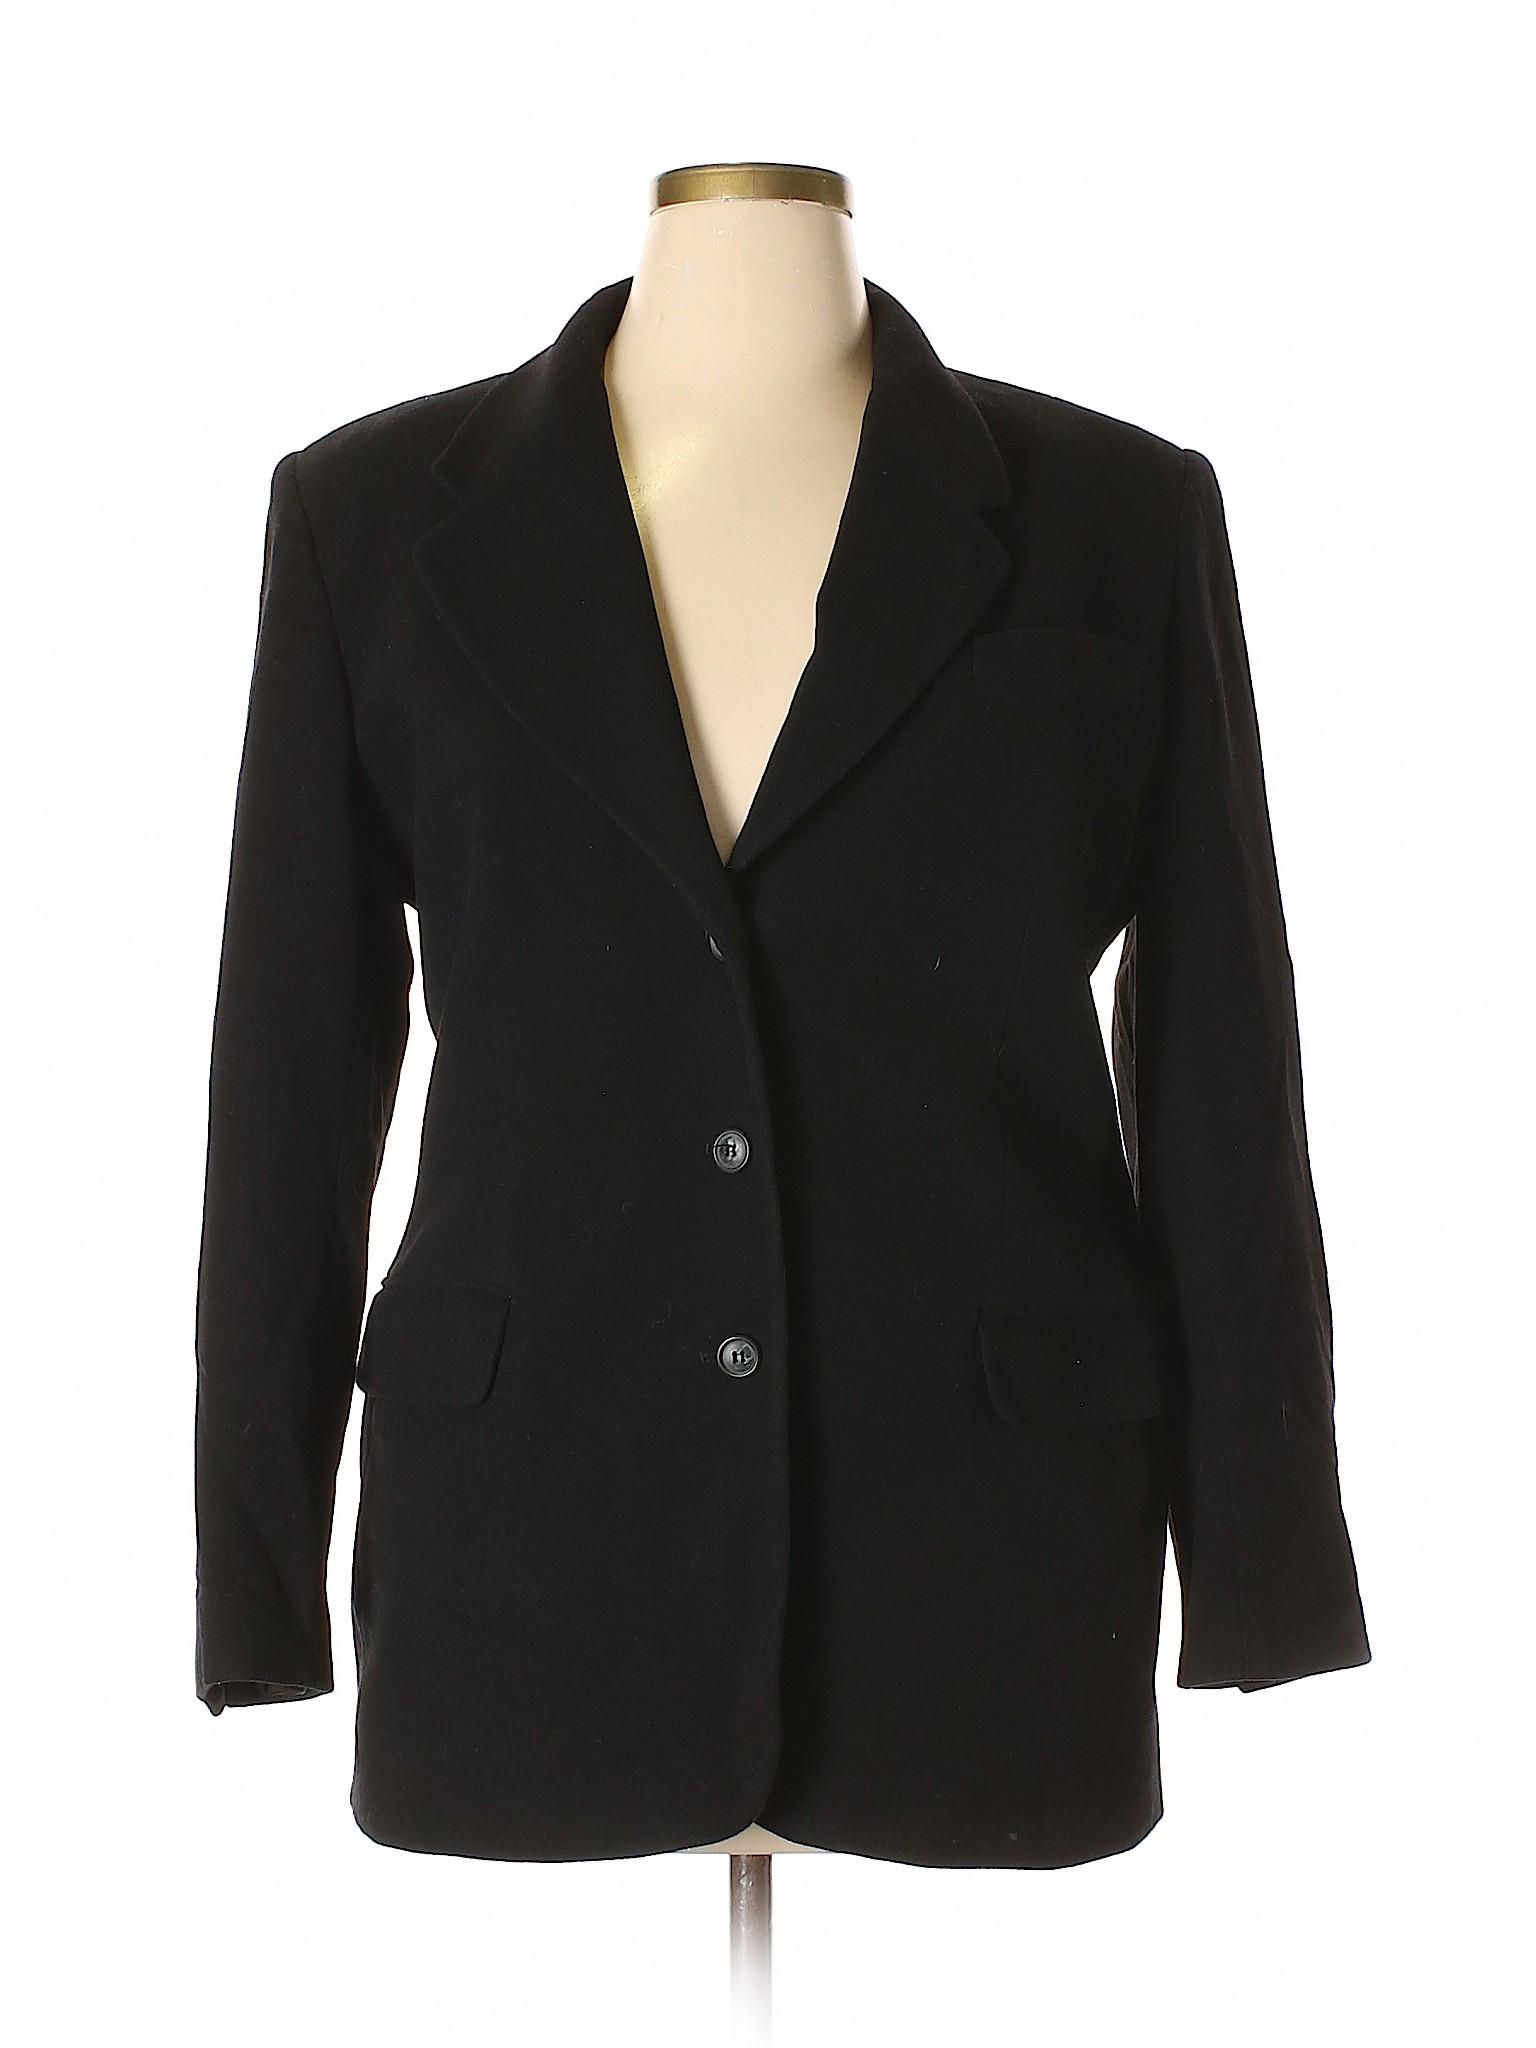 winter Wool Boutique Blazer Club Charter Hq0zxn1wd0